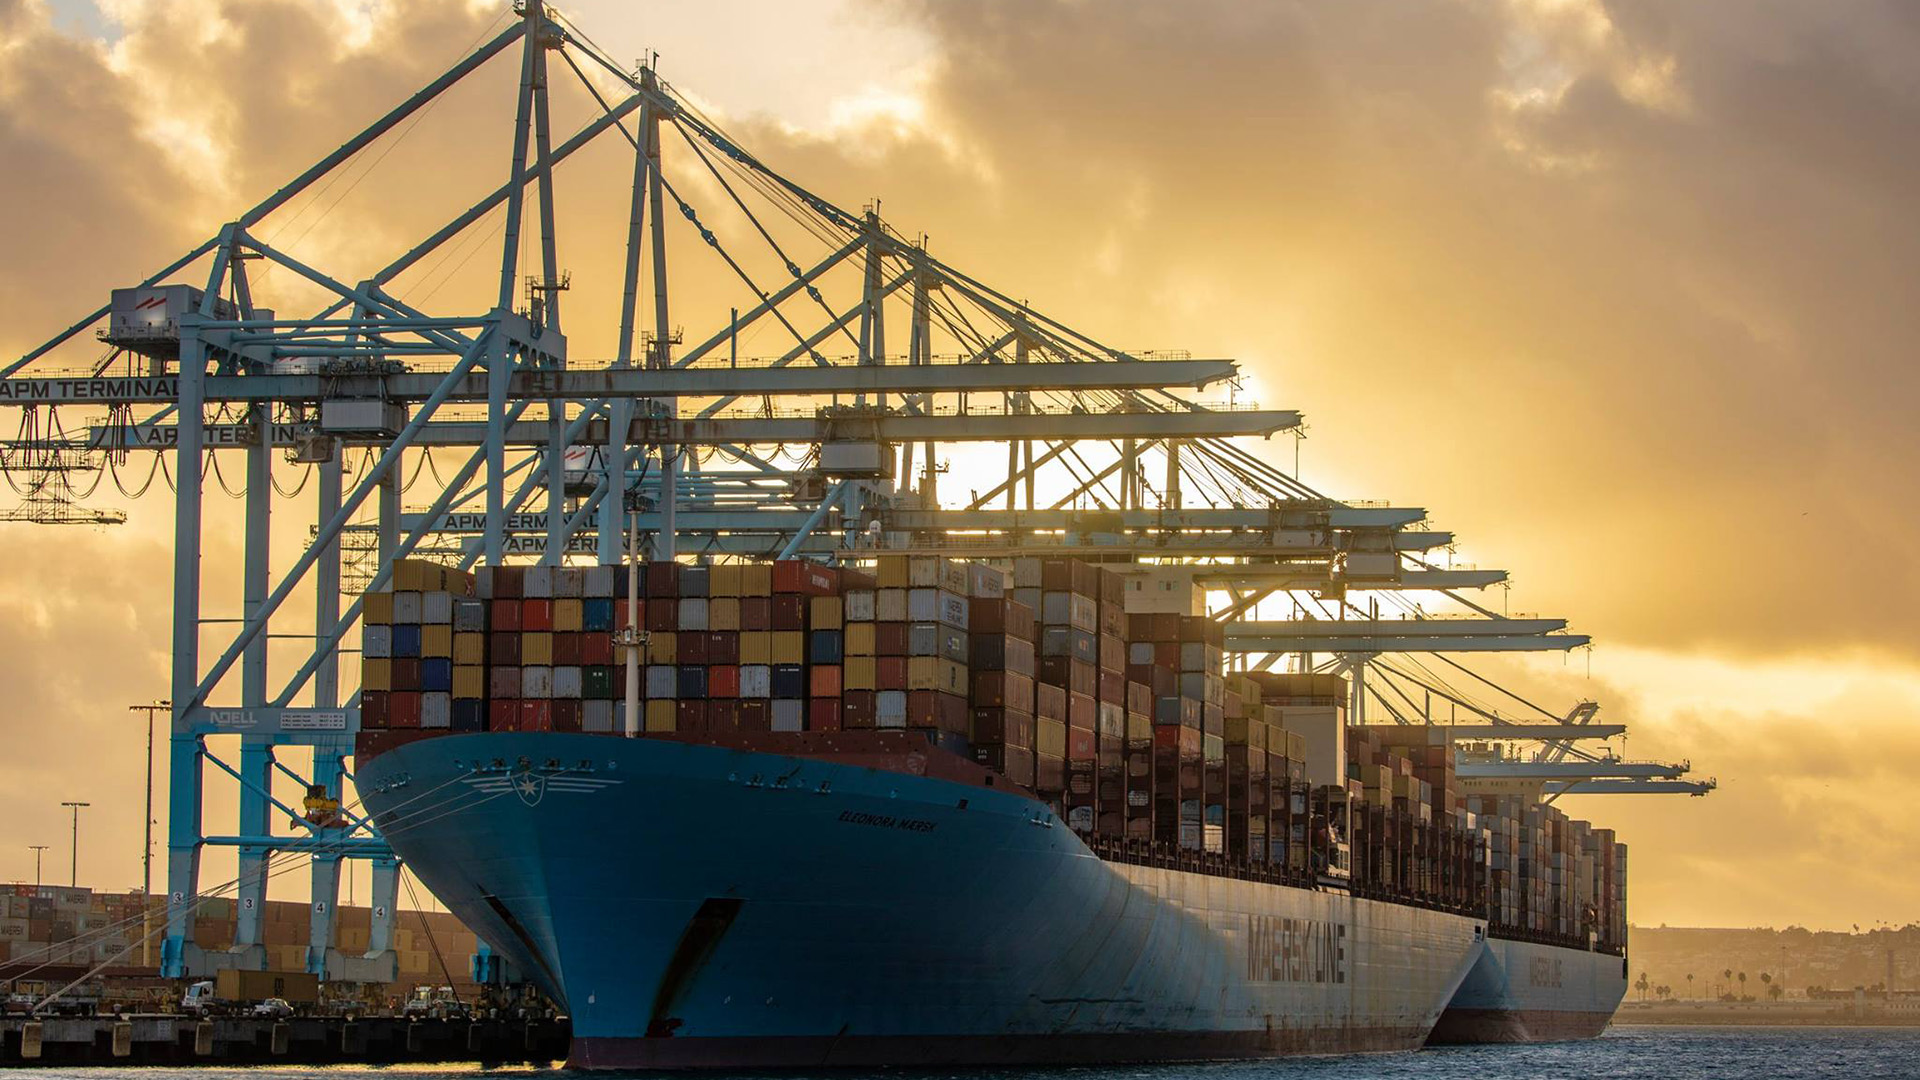 Elenora Maersk